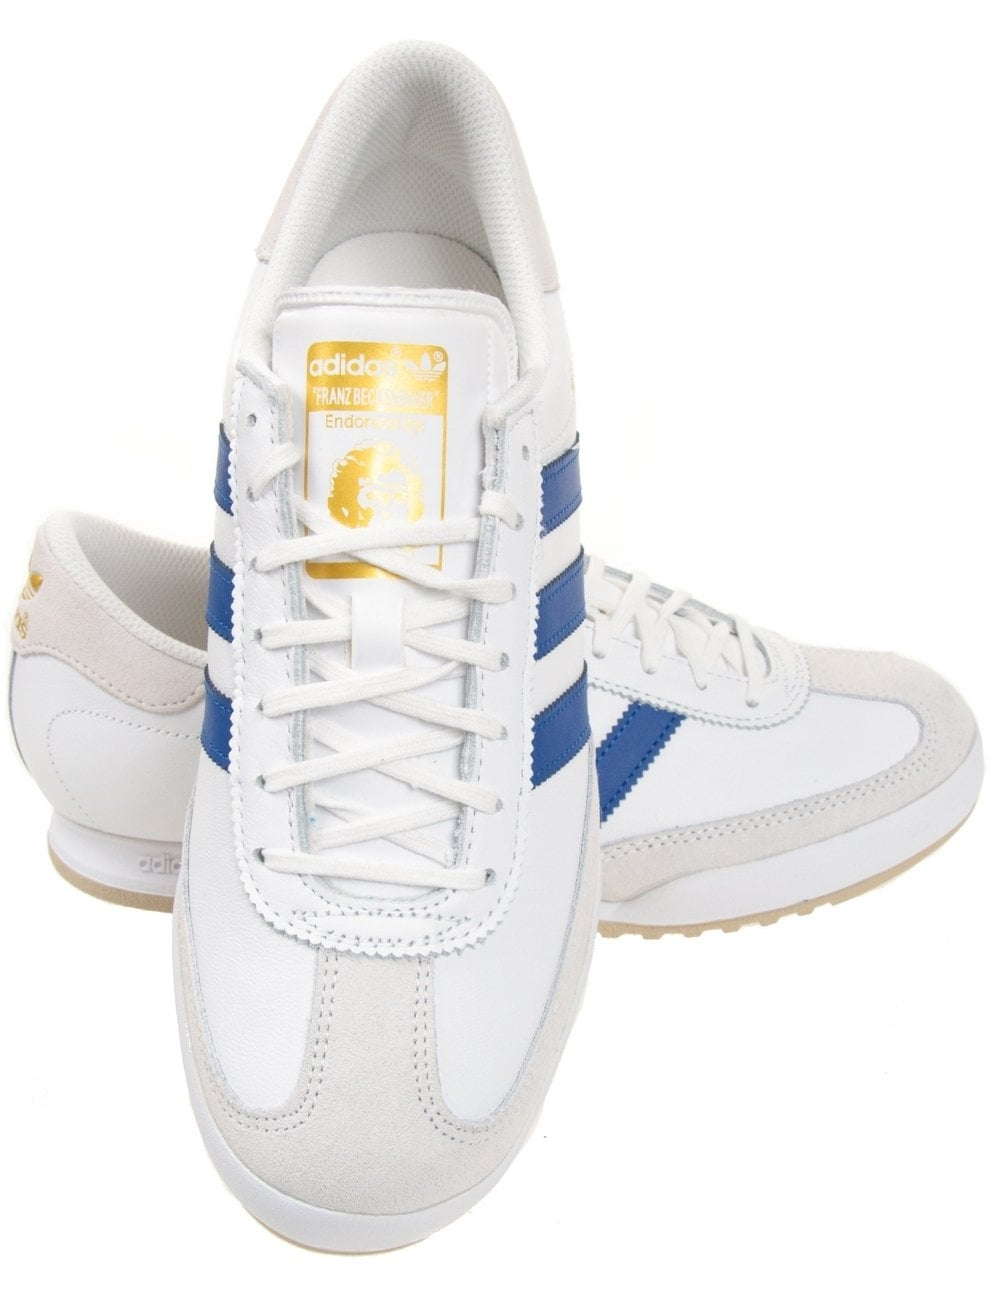 white beckenbauer trainers